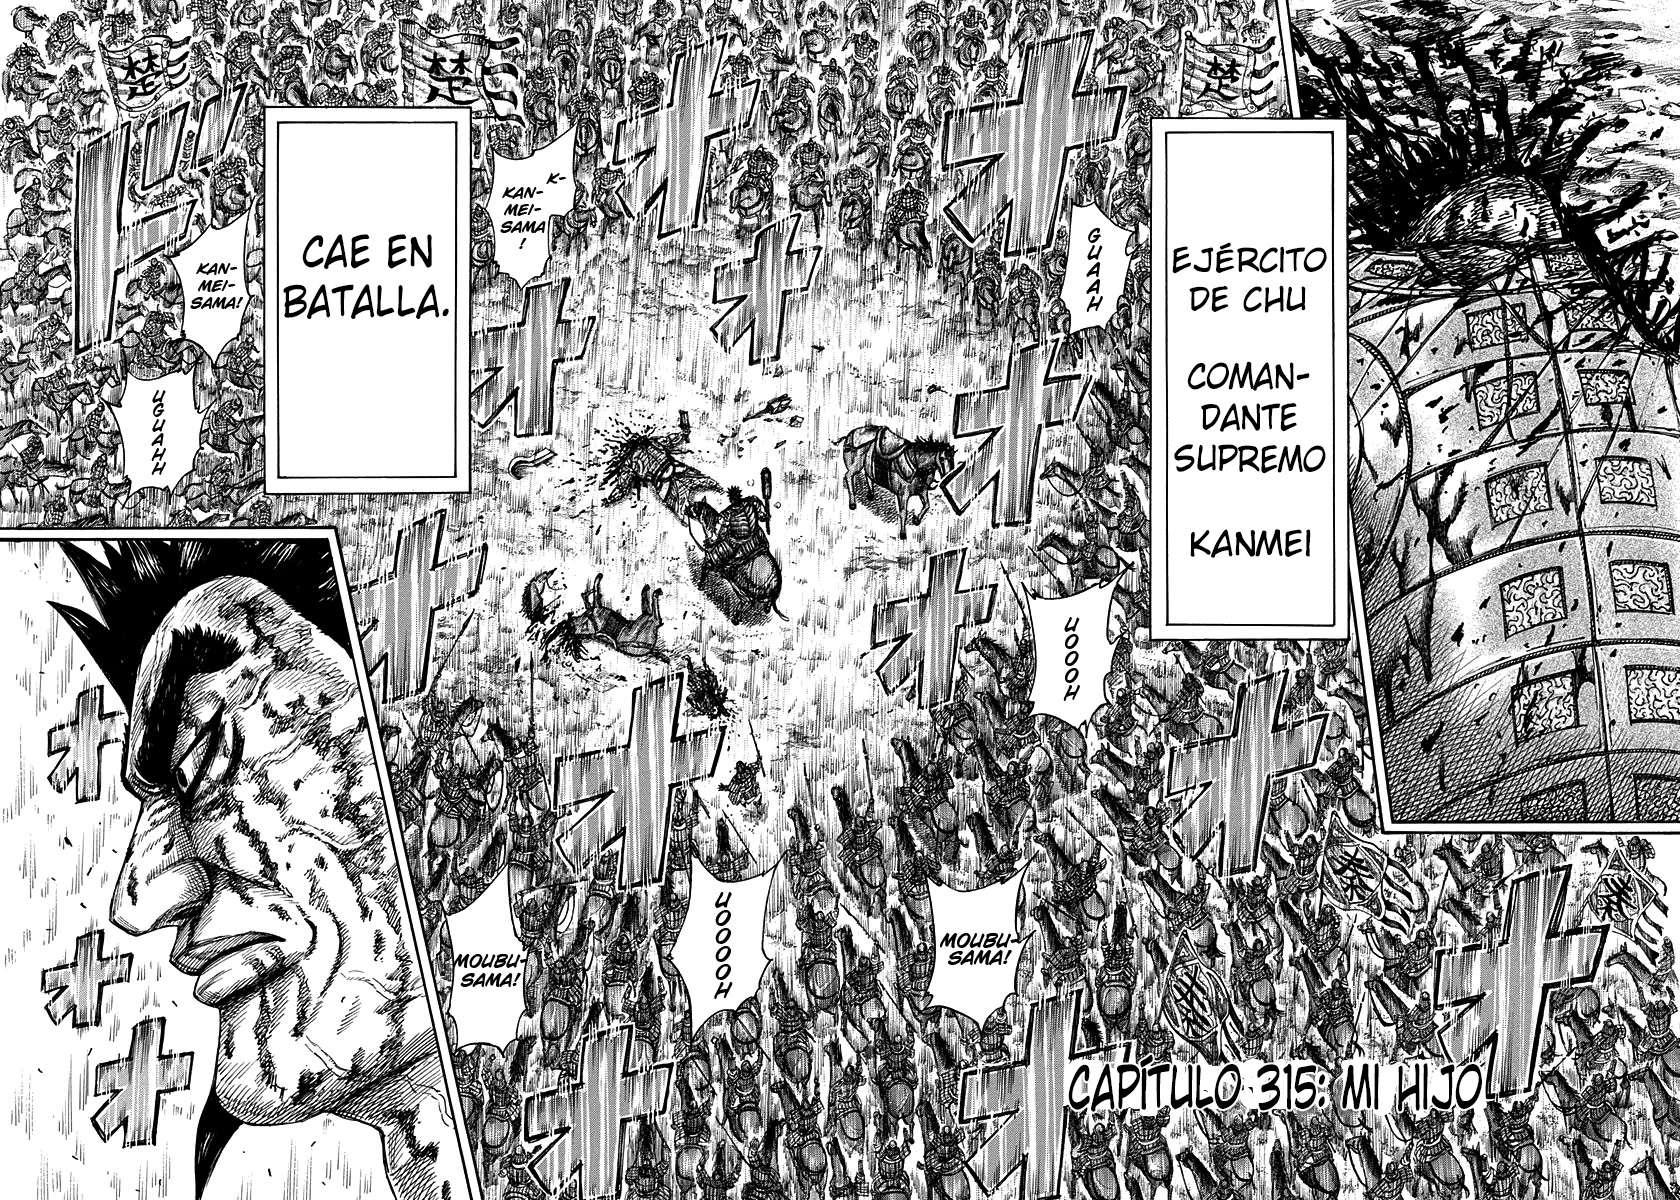 http://c5.ninemanga.com/es_manga/19/12307/360898/4c9eec3d7332e888b0020535fa030434.jpg Page 3